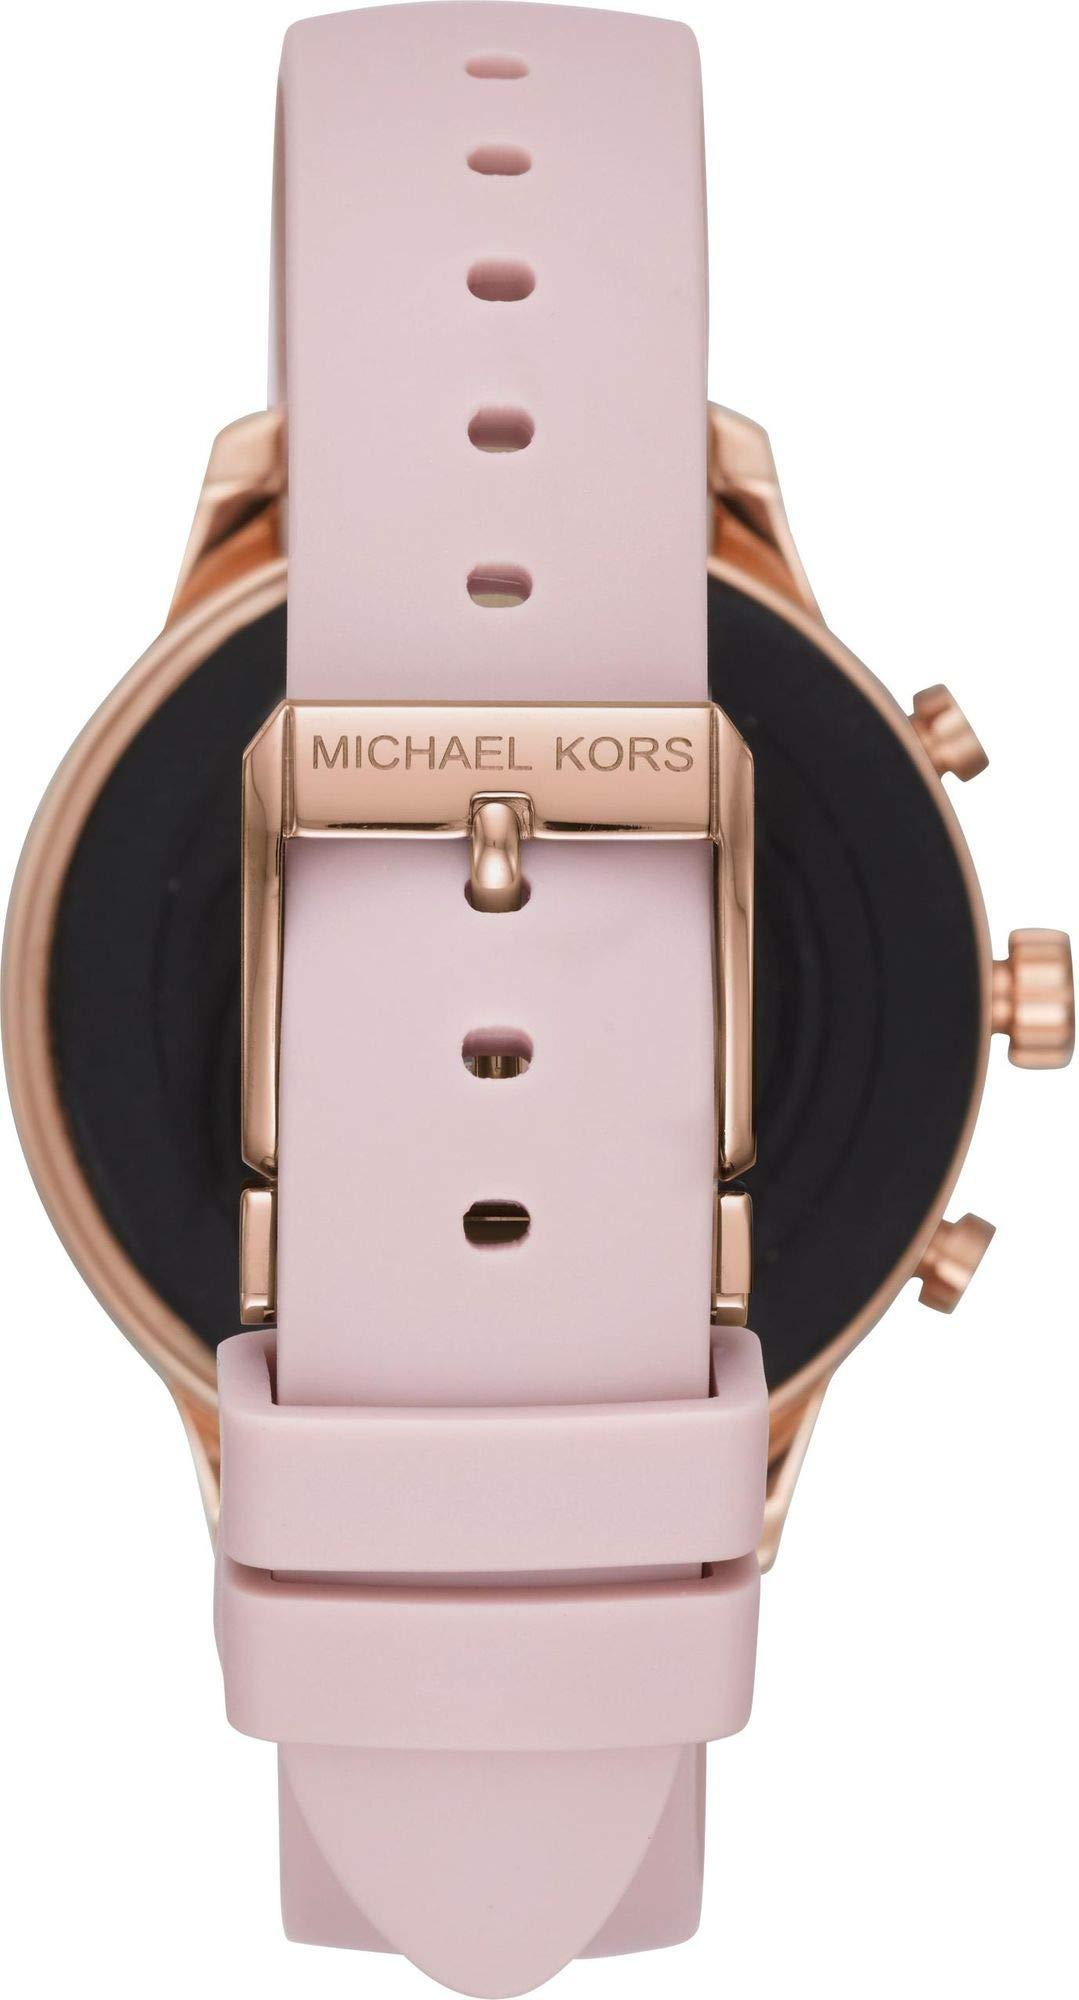 Gunstig Michael Kors Damen Smartwatch Mit Silikon Armband Mkt5048